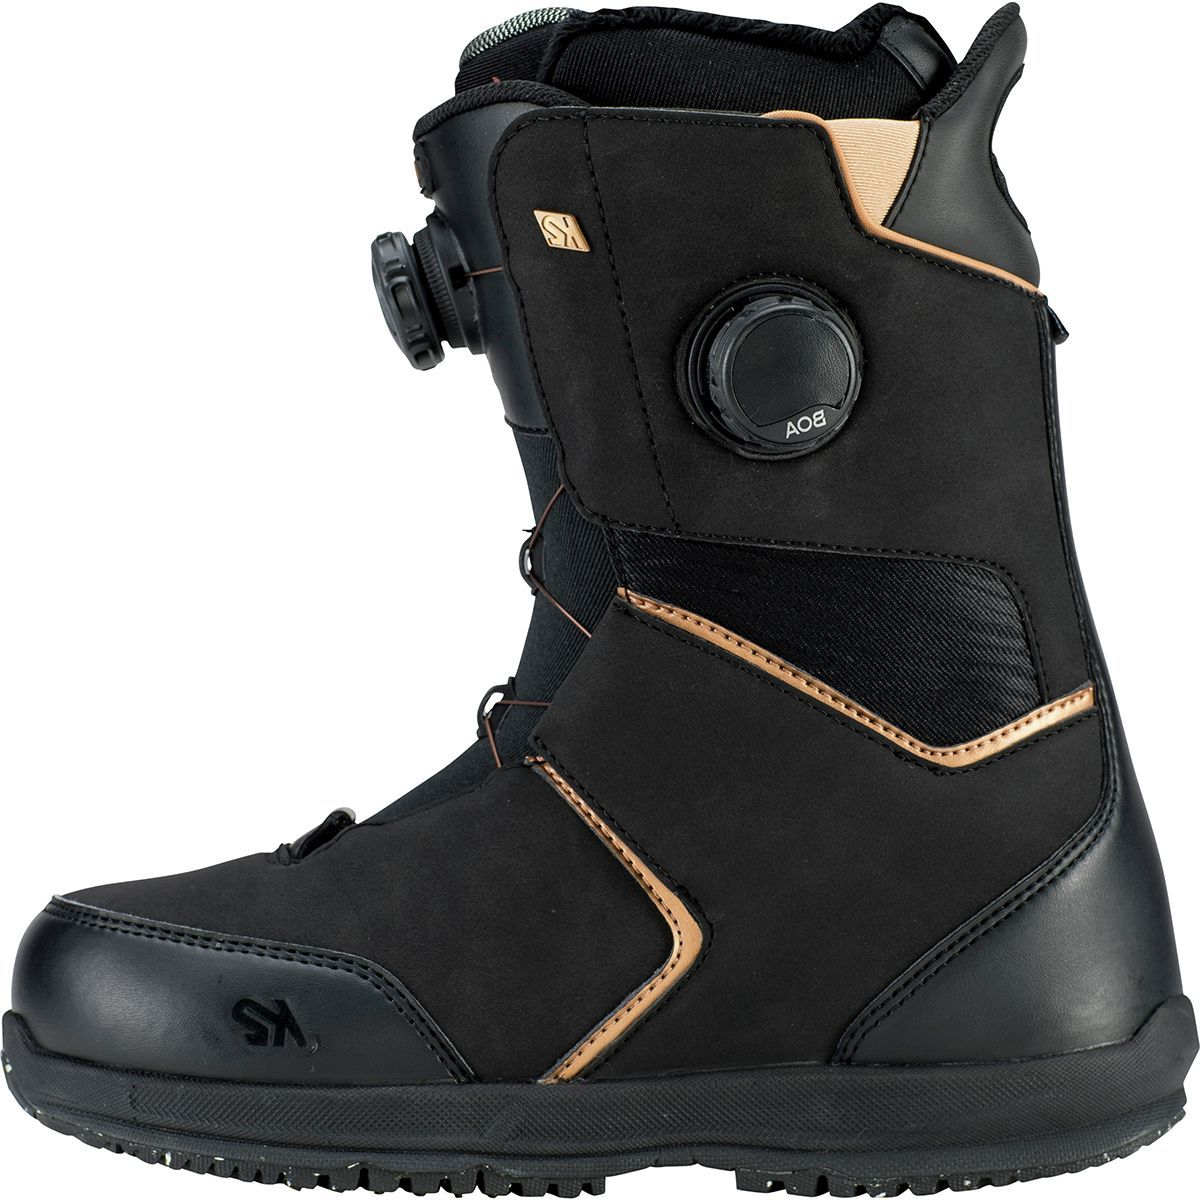 K2 Snowboards Estate Boa Snowboard Boot - Women's